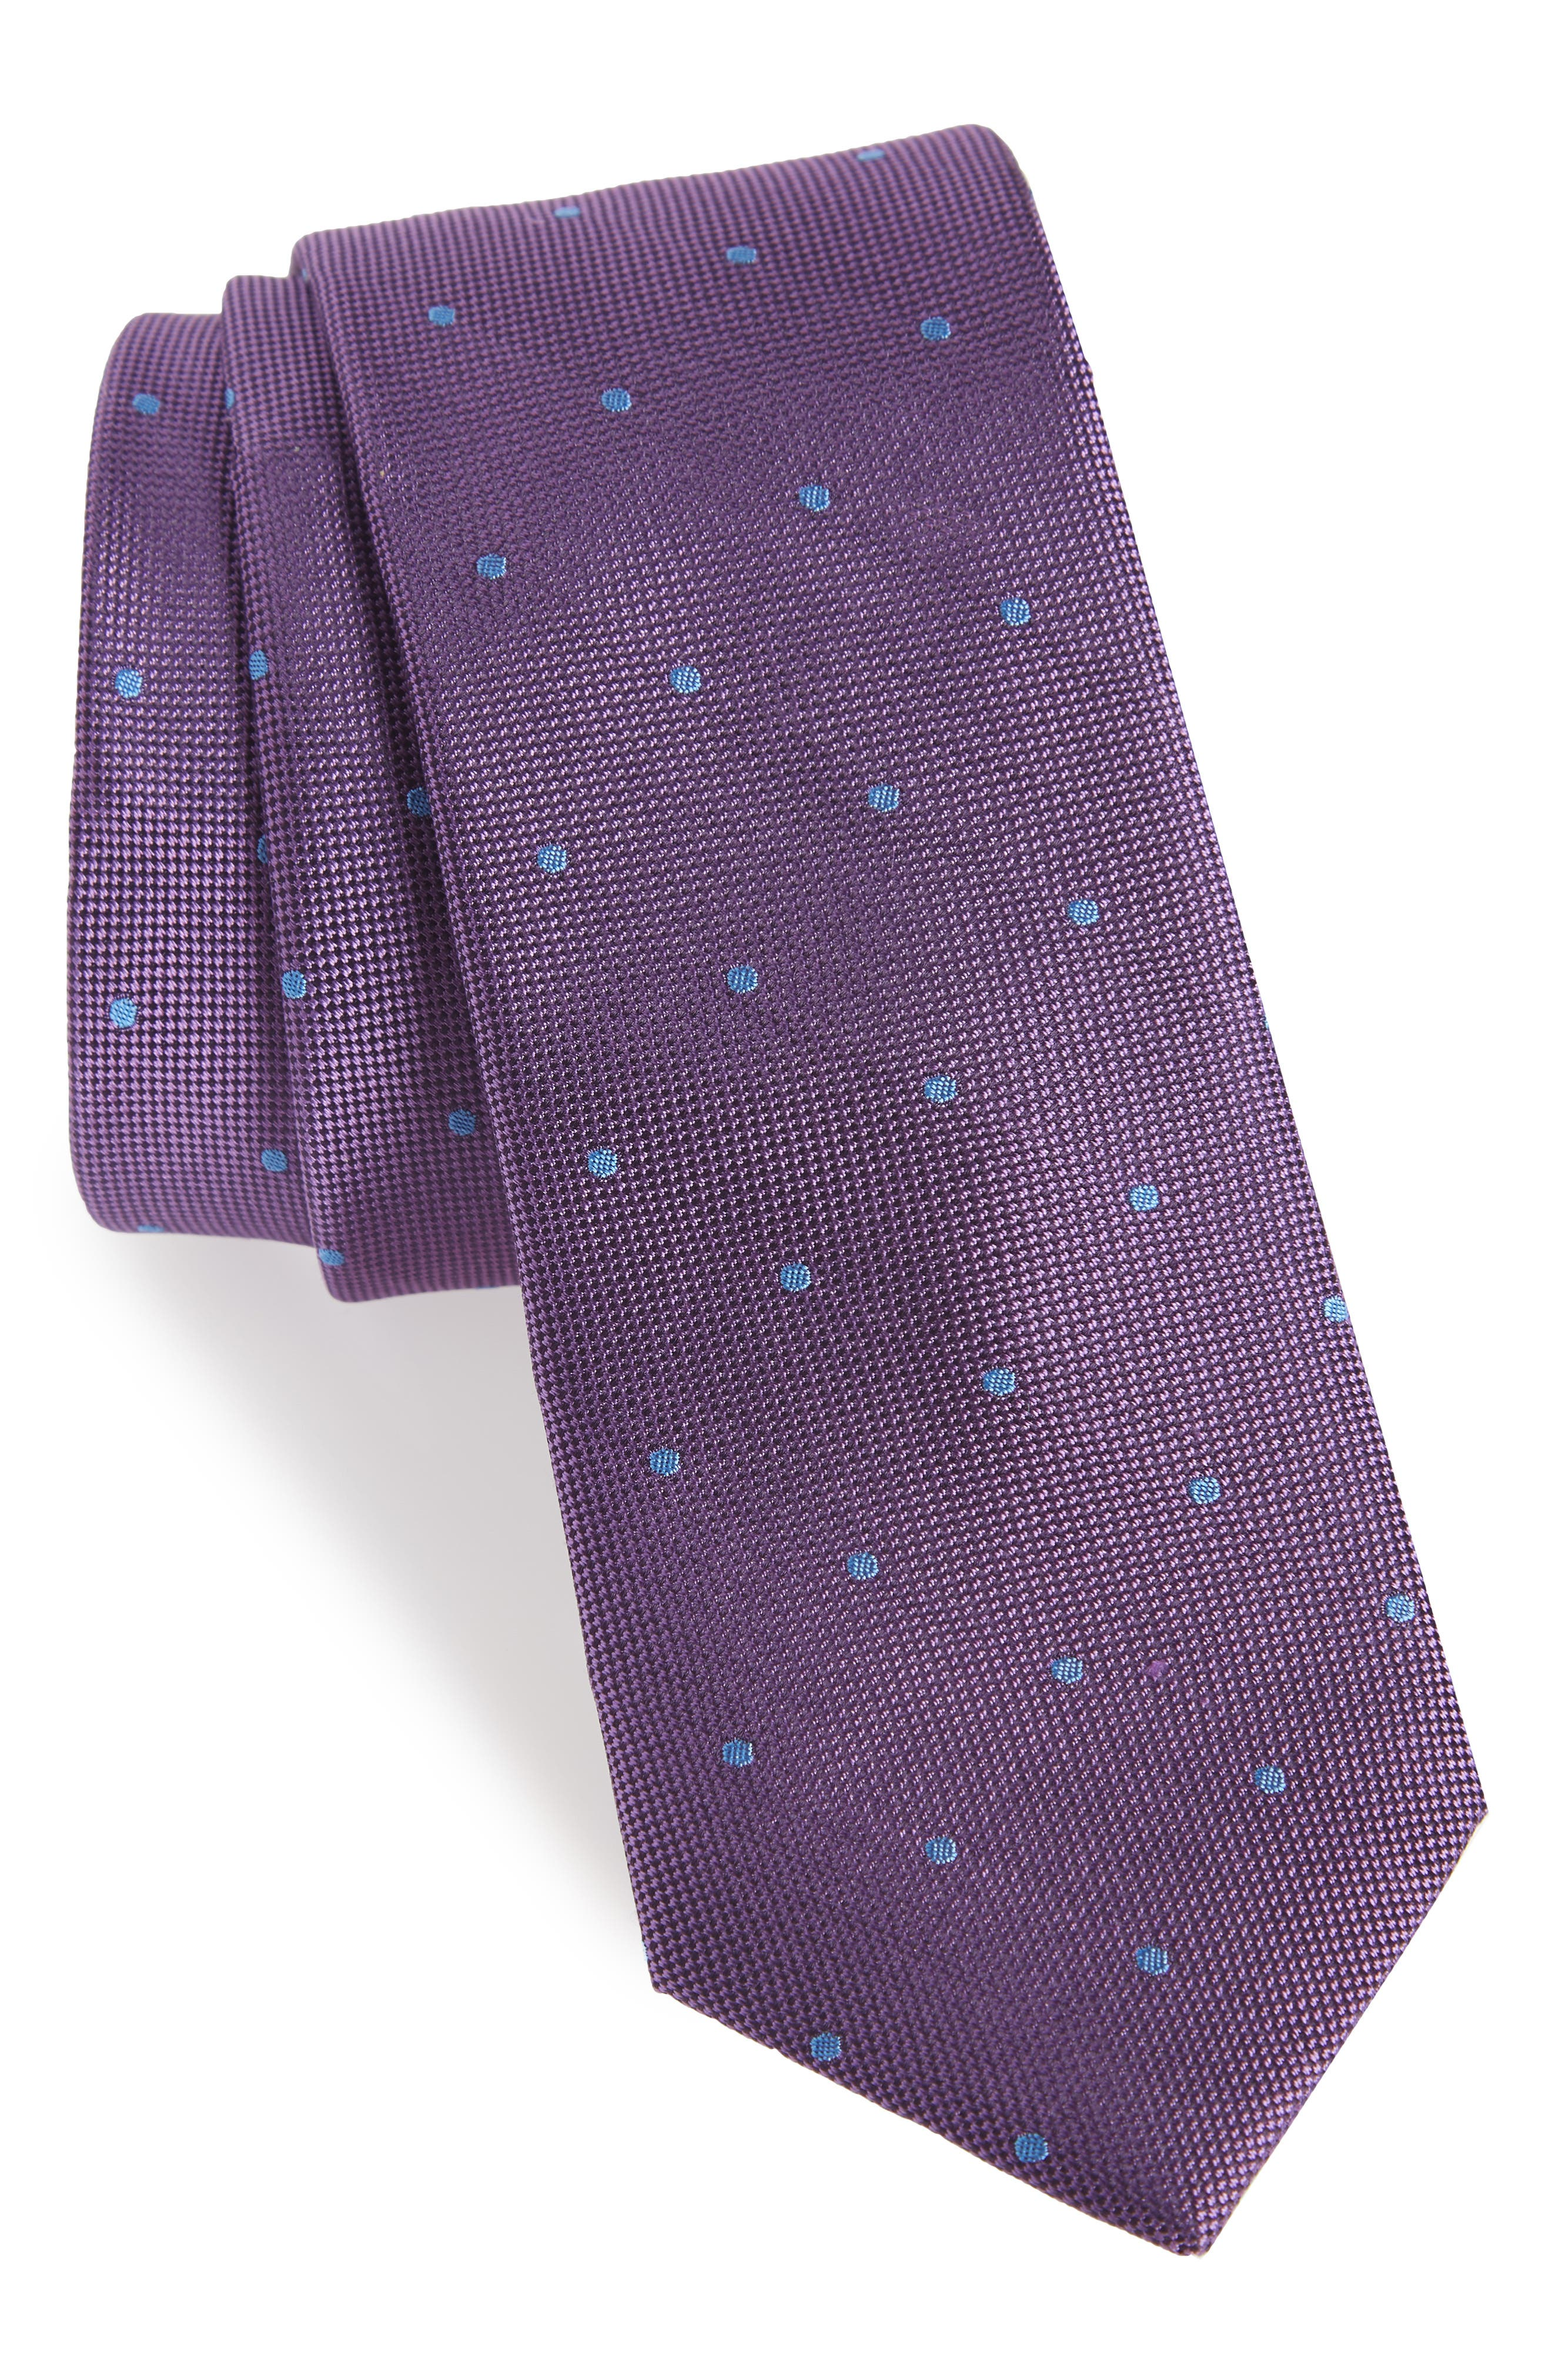 Arnet Dot Skinny Silk Tie,                             Main thumbnail 1, color,                             PURPLE